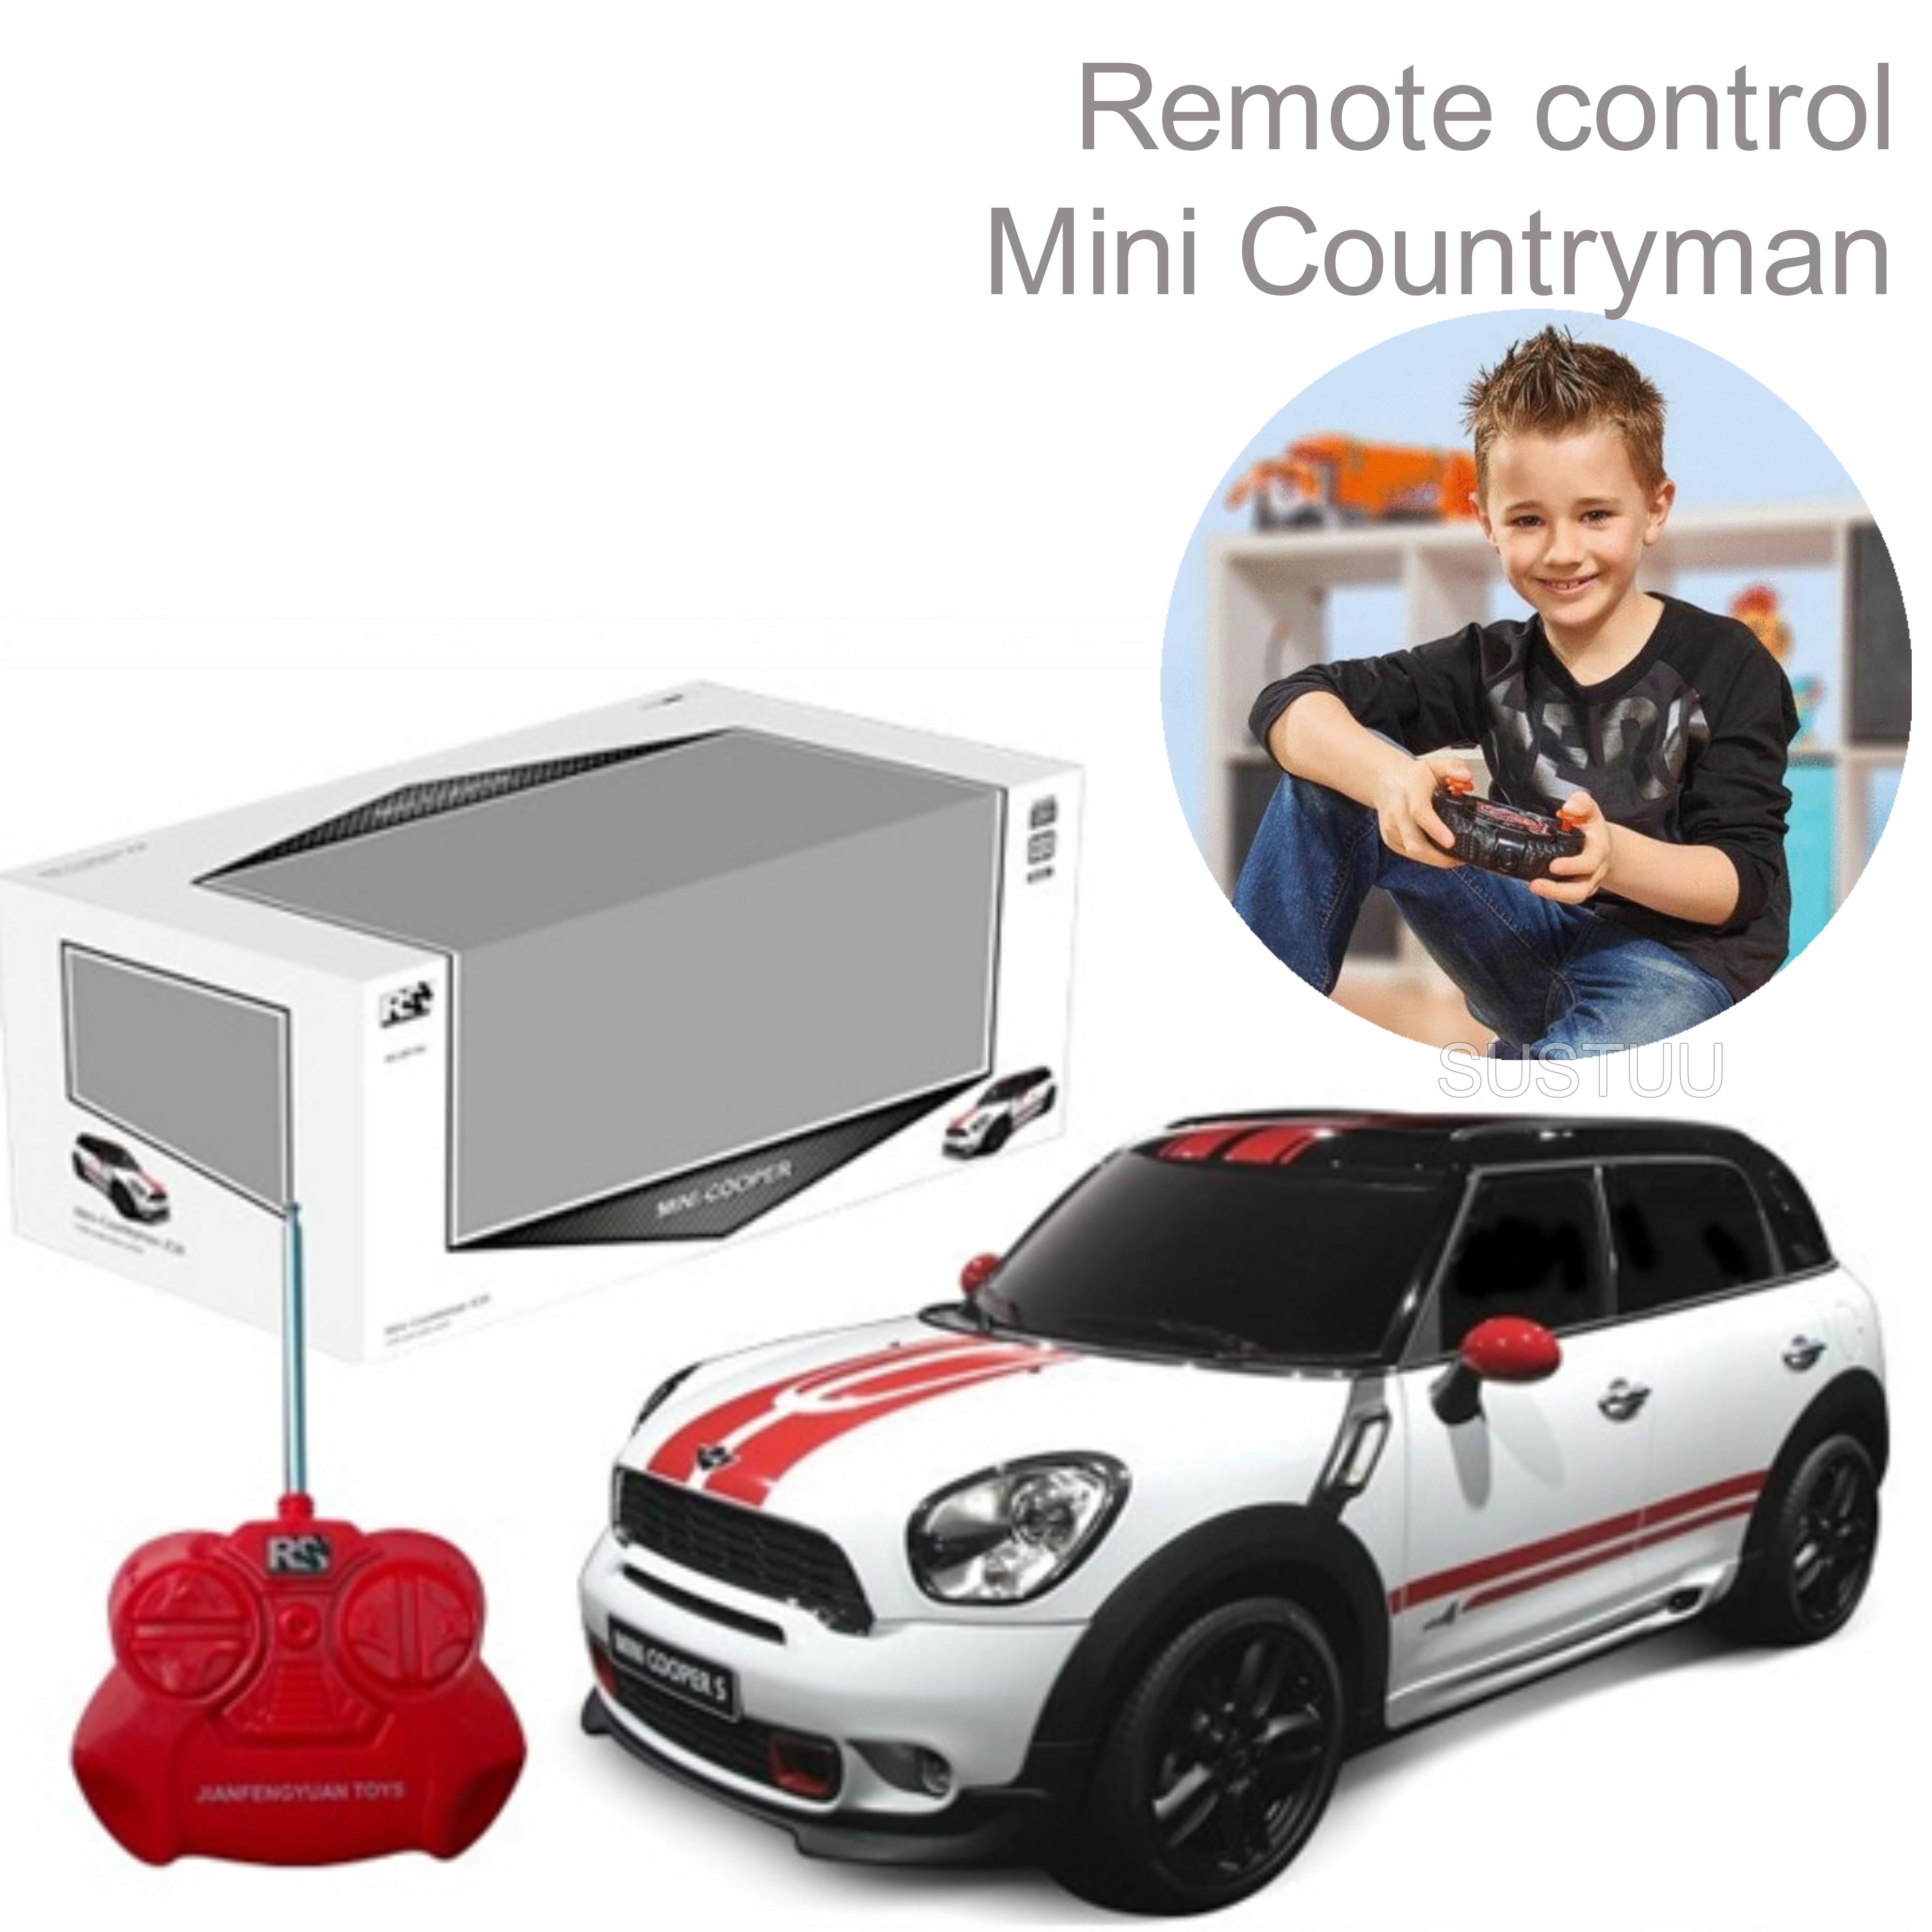 Amazing Remote Control Model Kids Toy Car | Mini Countryman 1:24 Scale | White | New